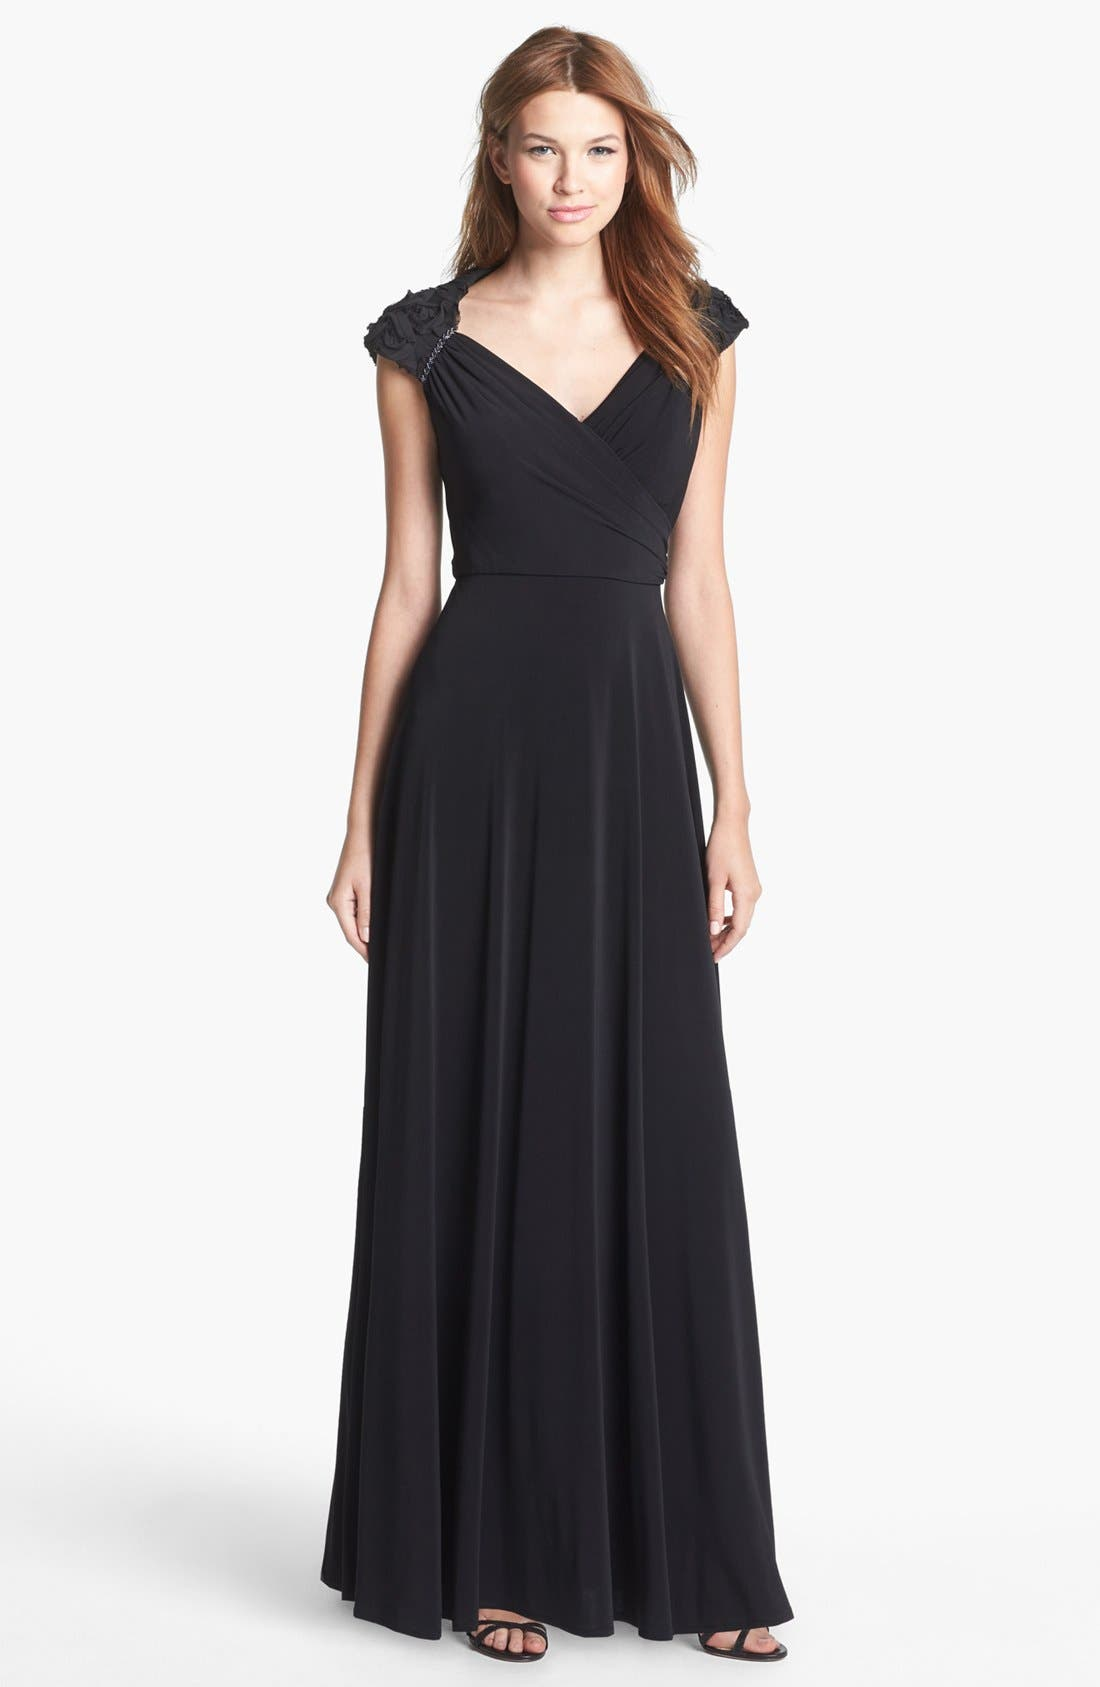 Main Image - Patra 'Queen Anne' Ruffle Detail Jersey Dress